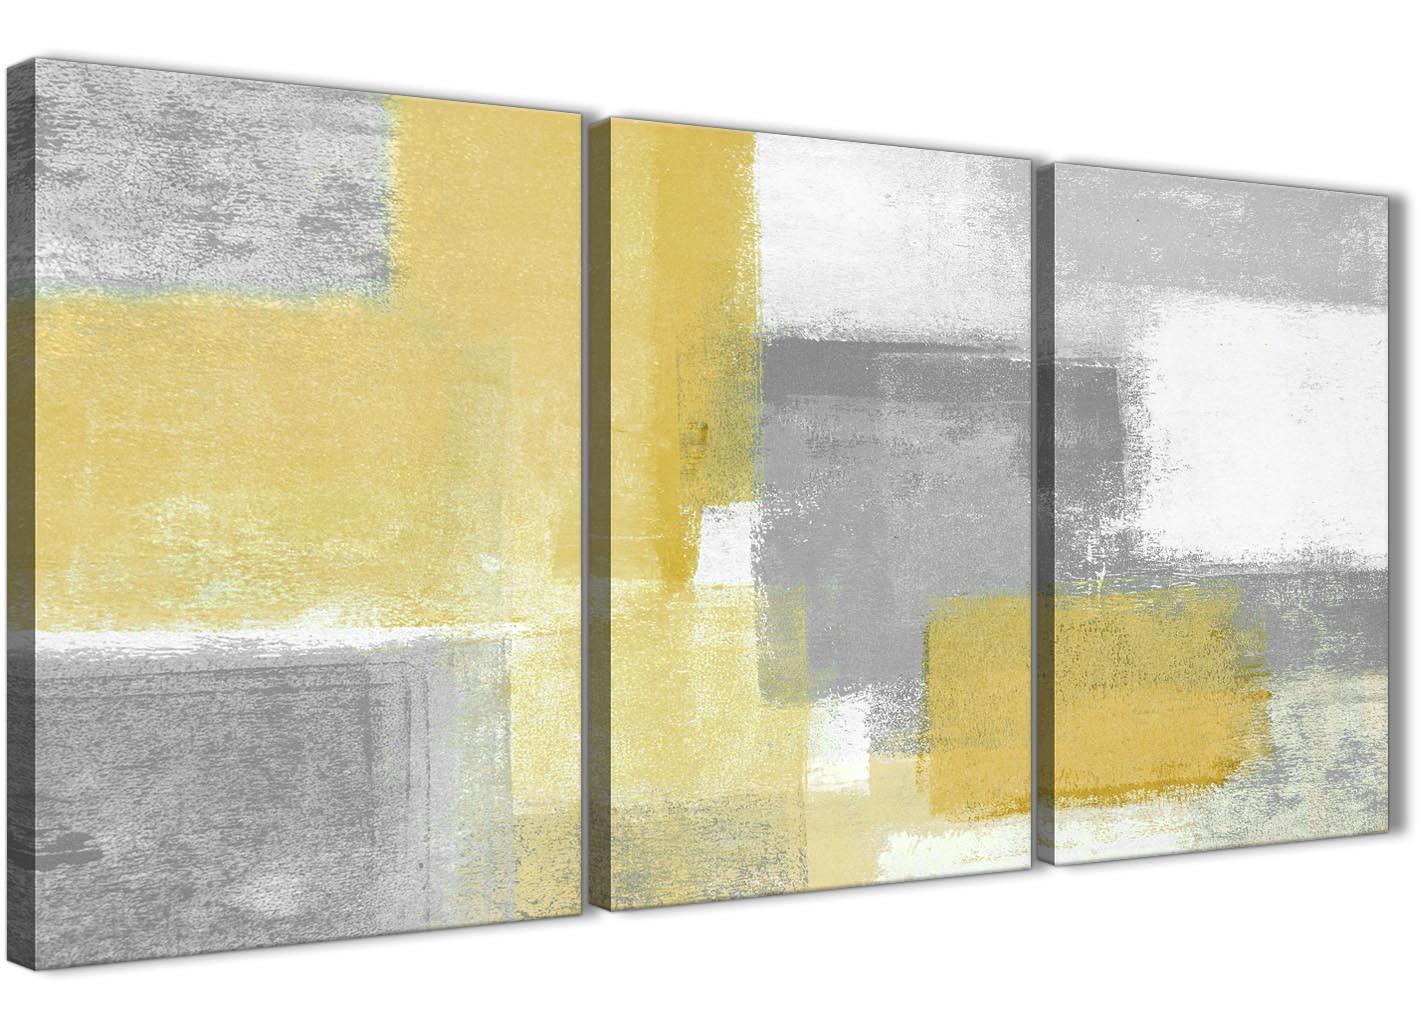 Brown Canvas Wall Art - Elitflat